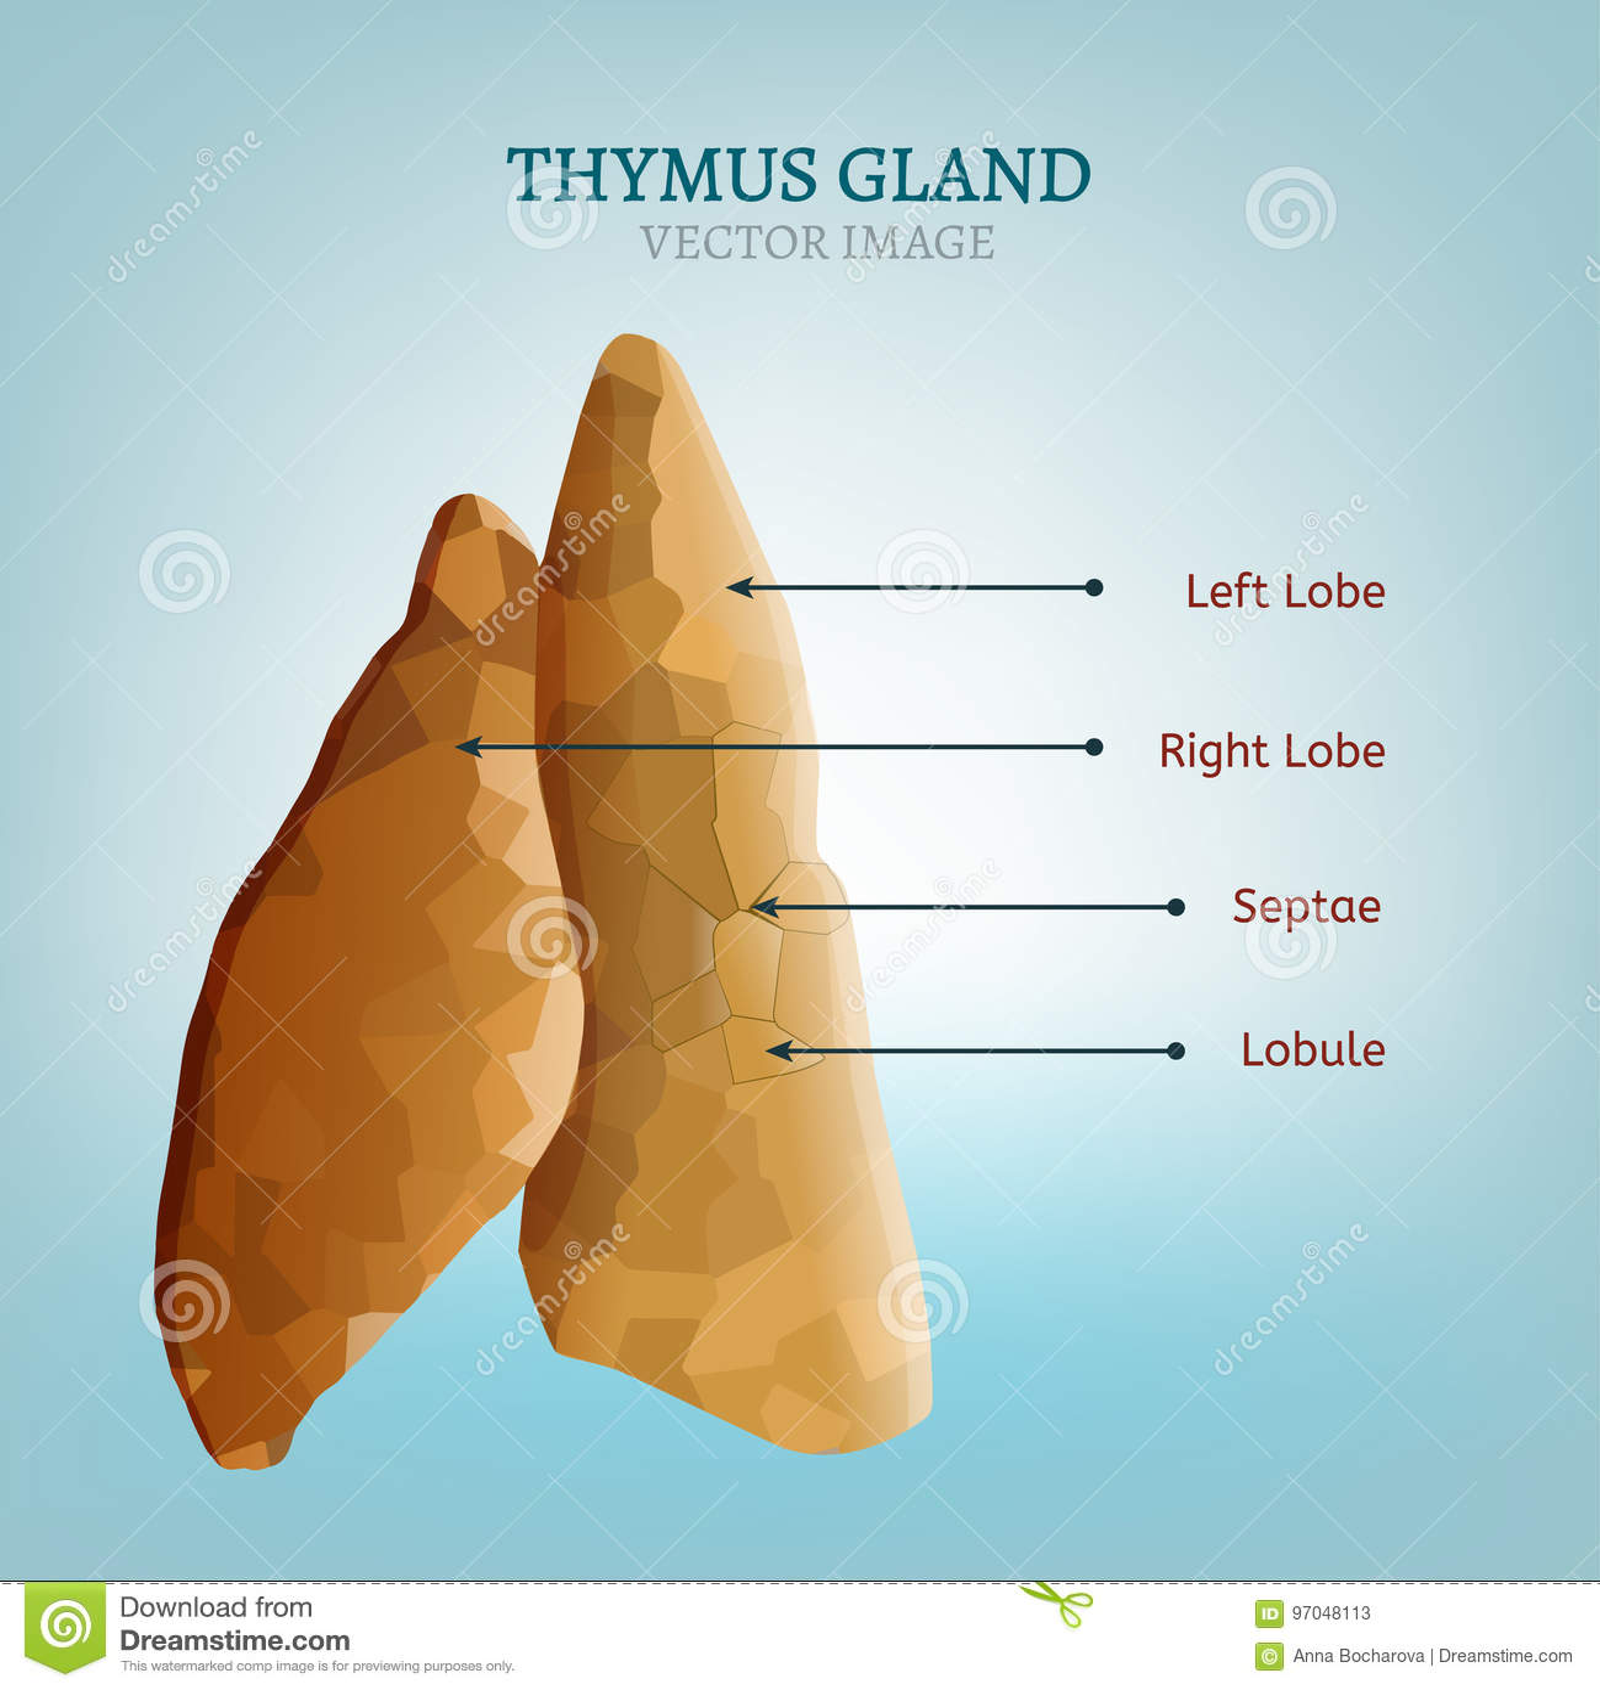 Thymus Gland Image Stock Vector Illustration Of Immune 97048113